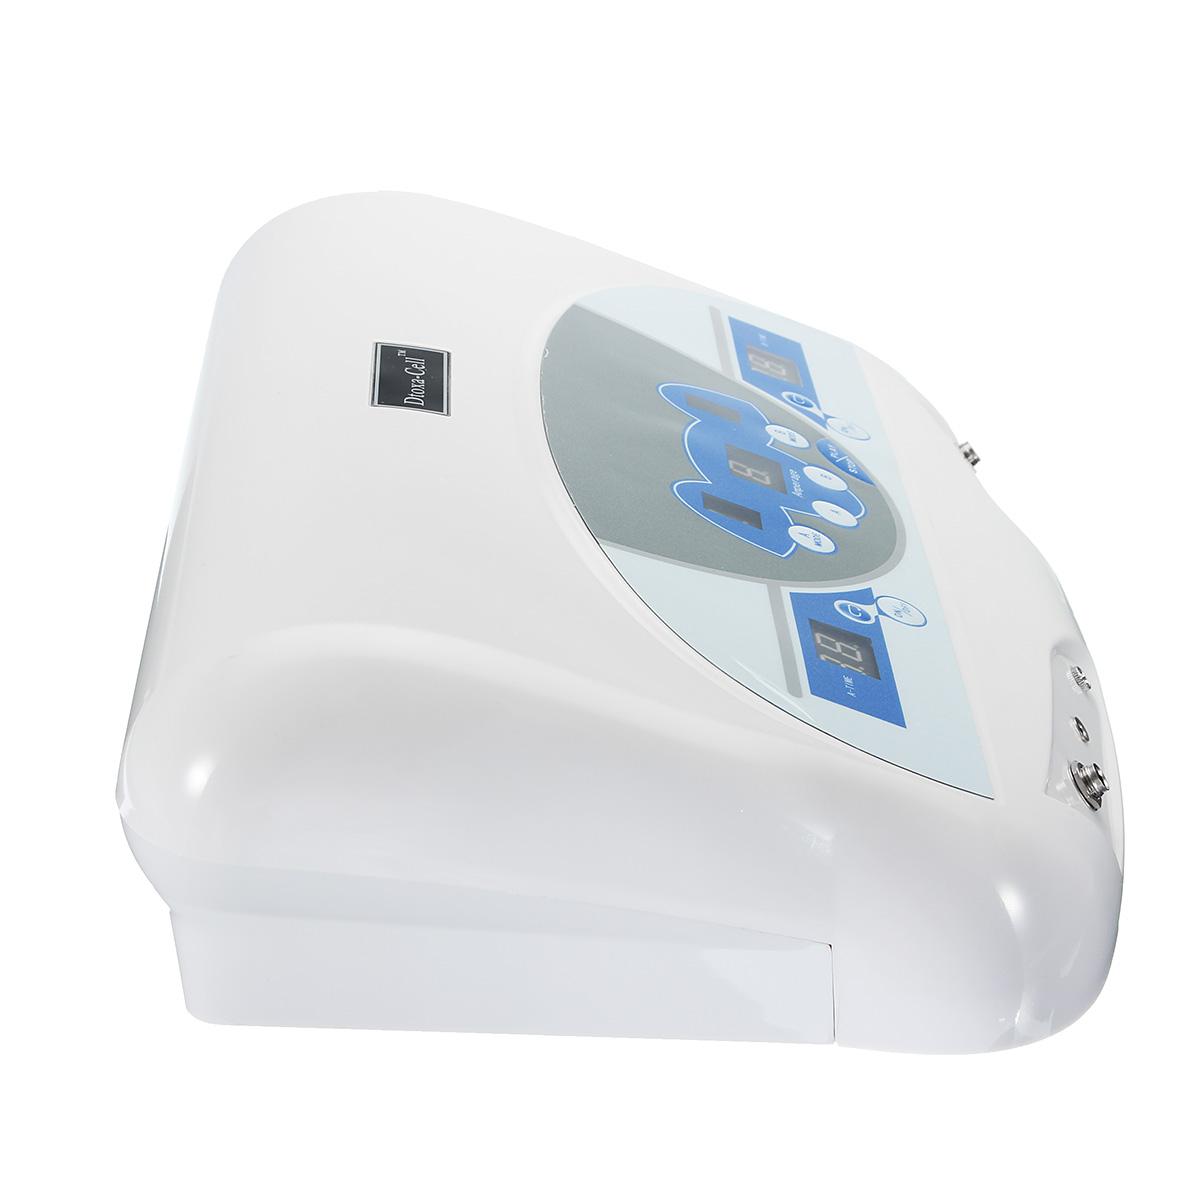 Dual Ionic Ion Detox Machine Aqua Foot Bath Spa Mp3 Music Cleanse For Health Alexnld Com